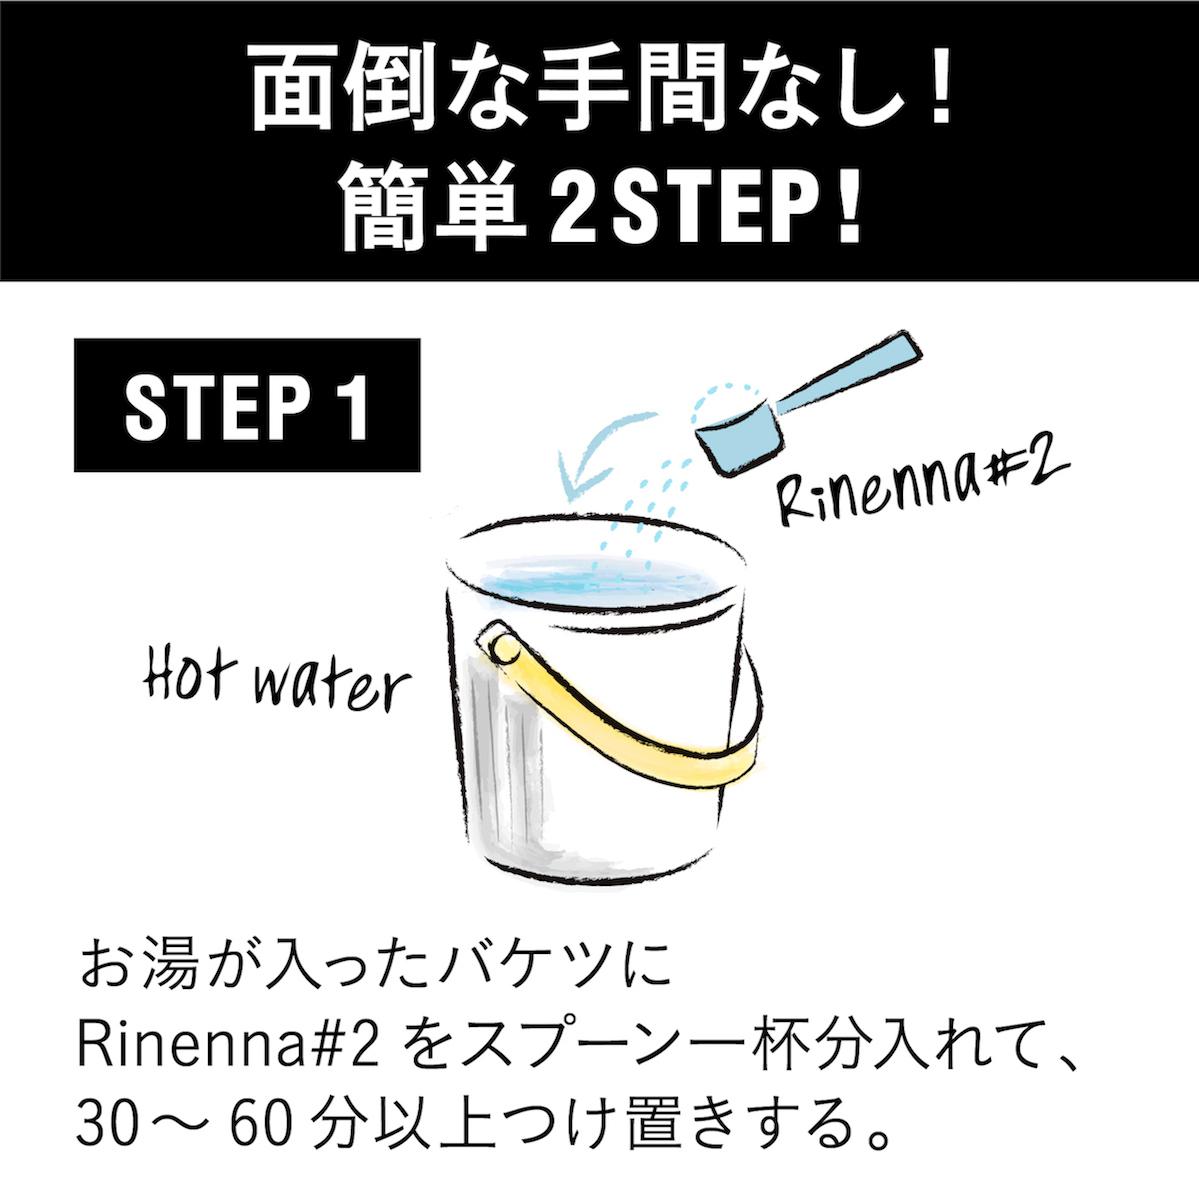 【VERY掲載】Rinenna#2 スターターセット バケツサイズS・L